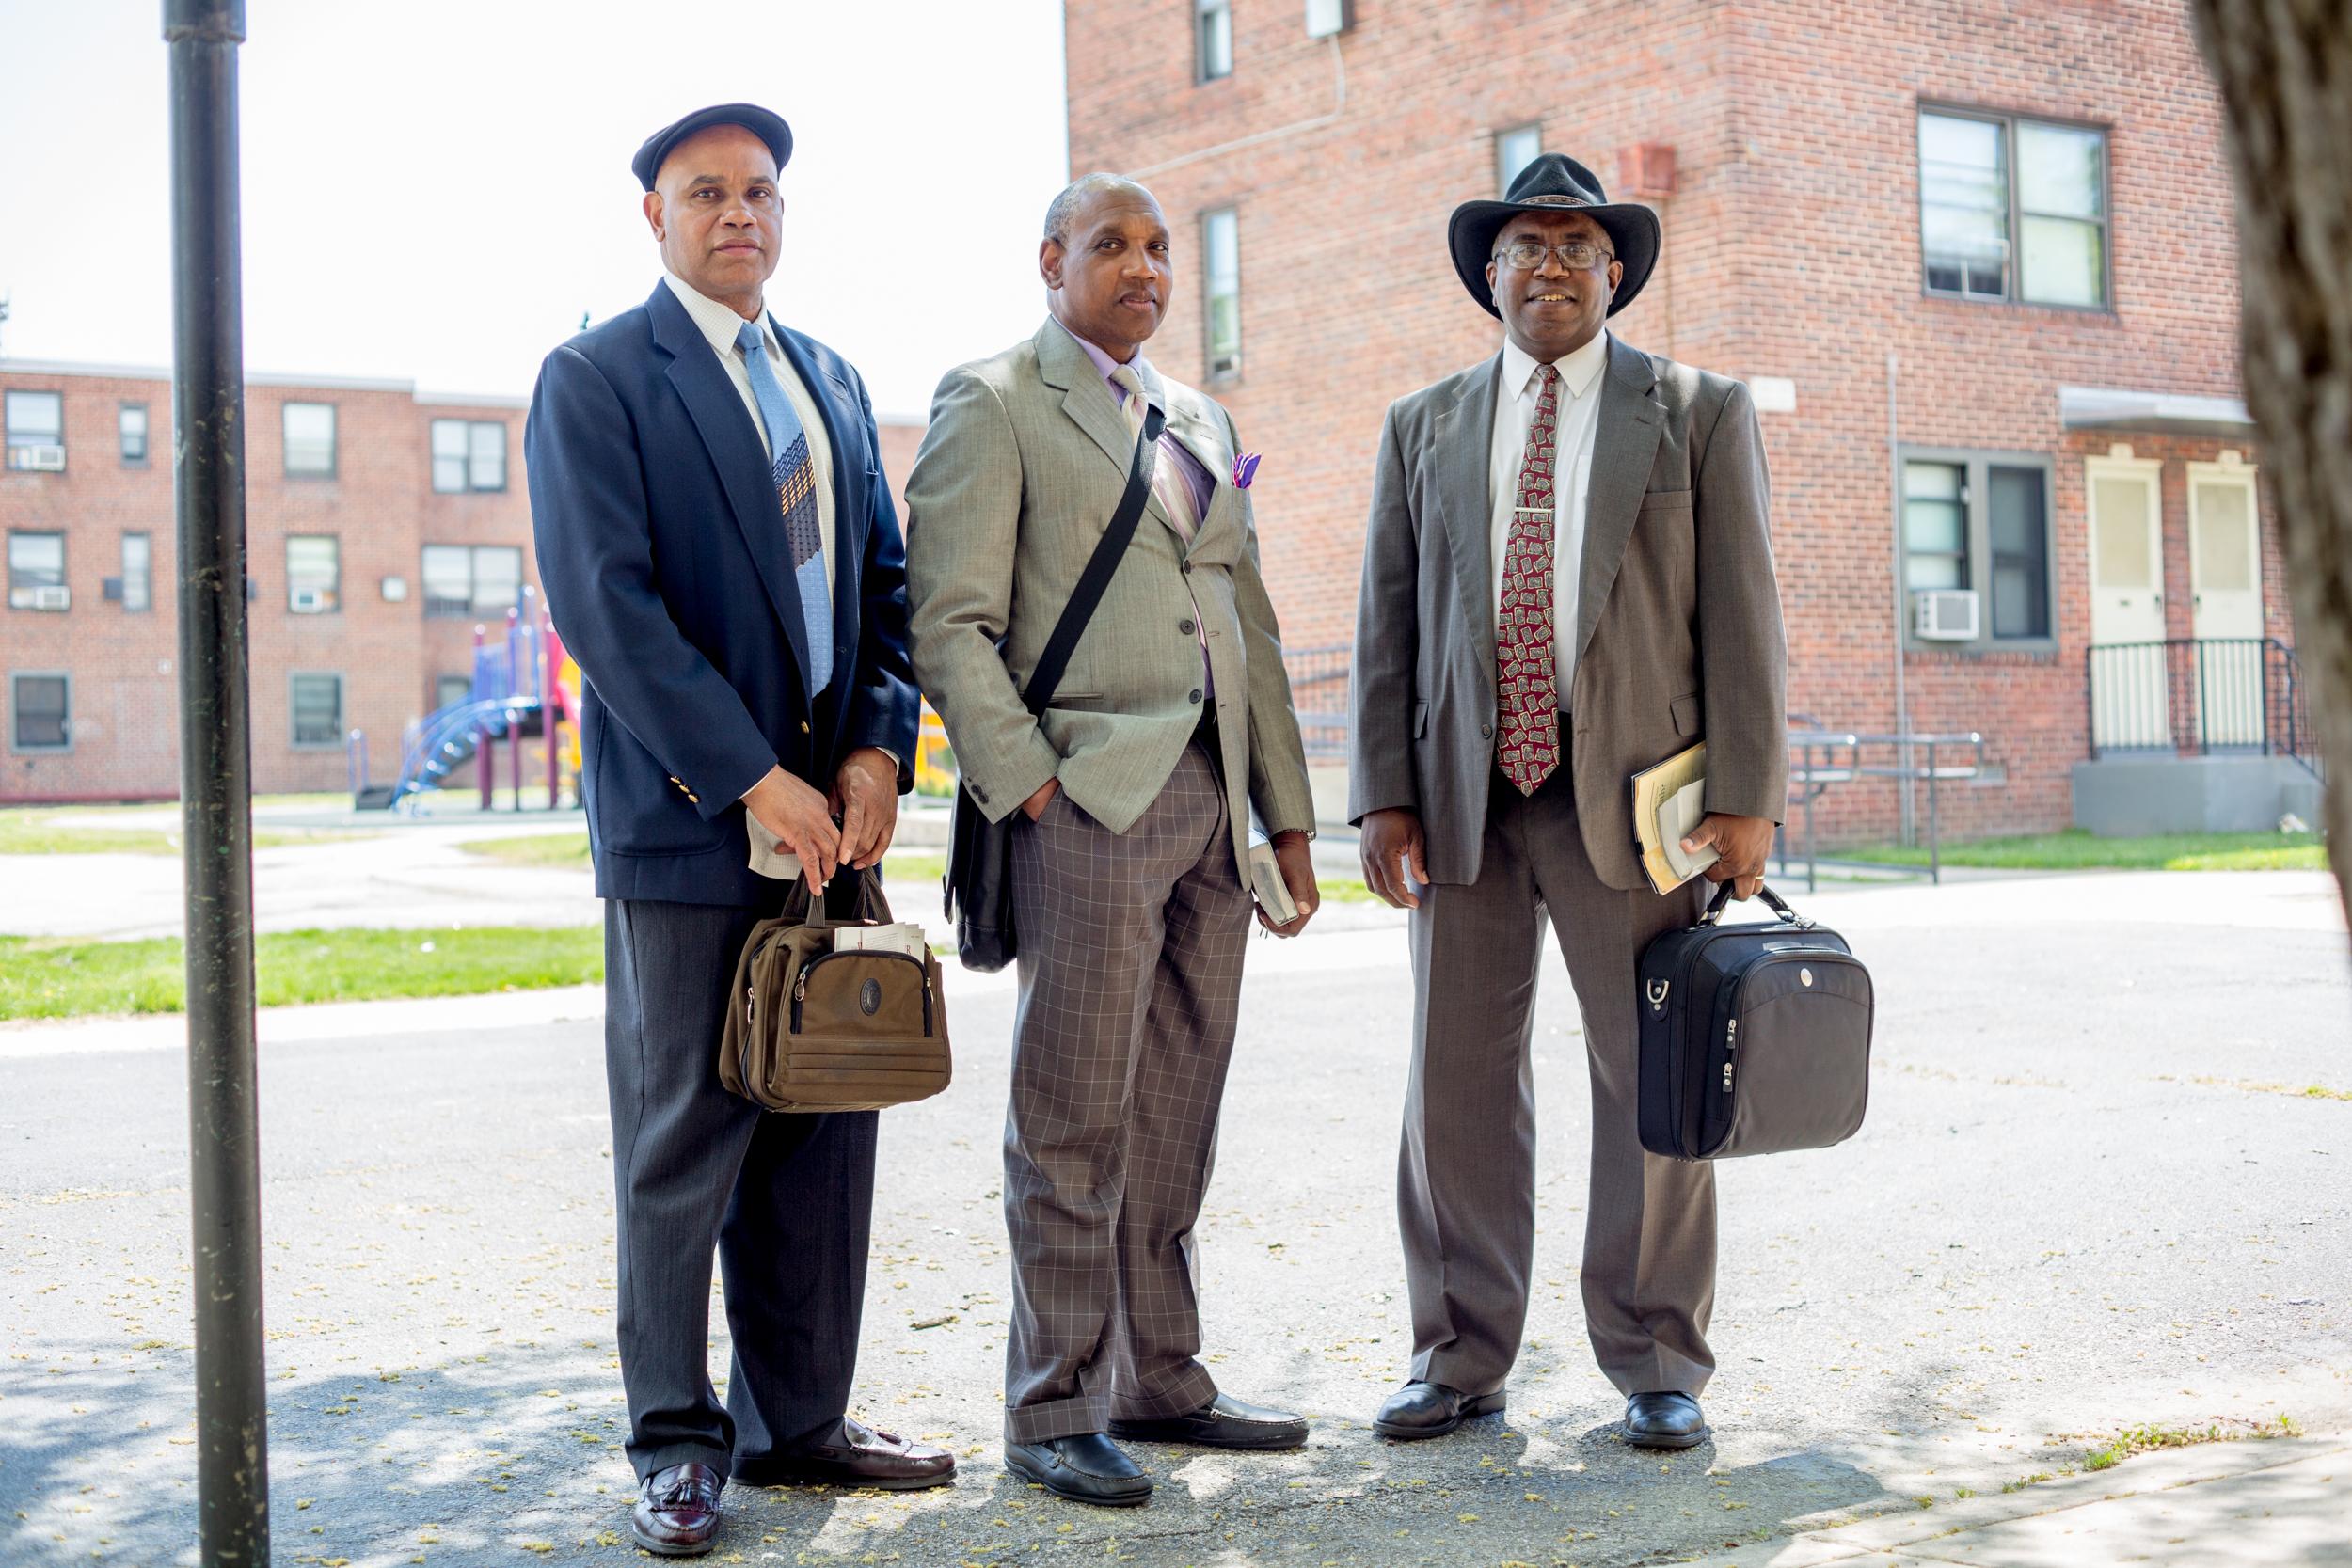 Raymond Carr, 55, David Johnson, 52, and Keith Randall, 56 three Baltimore-area pastors.